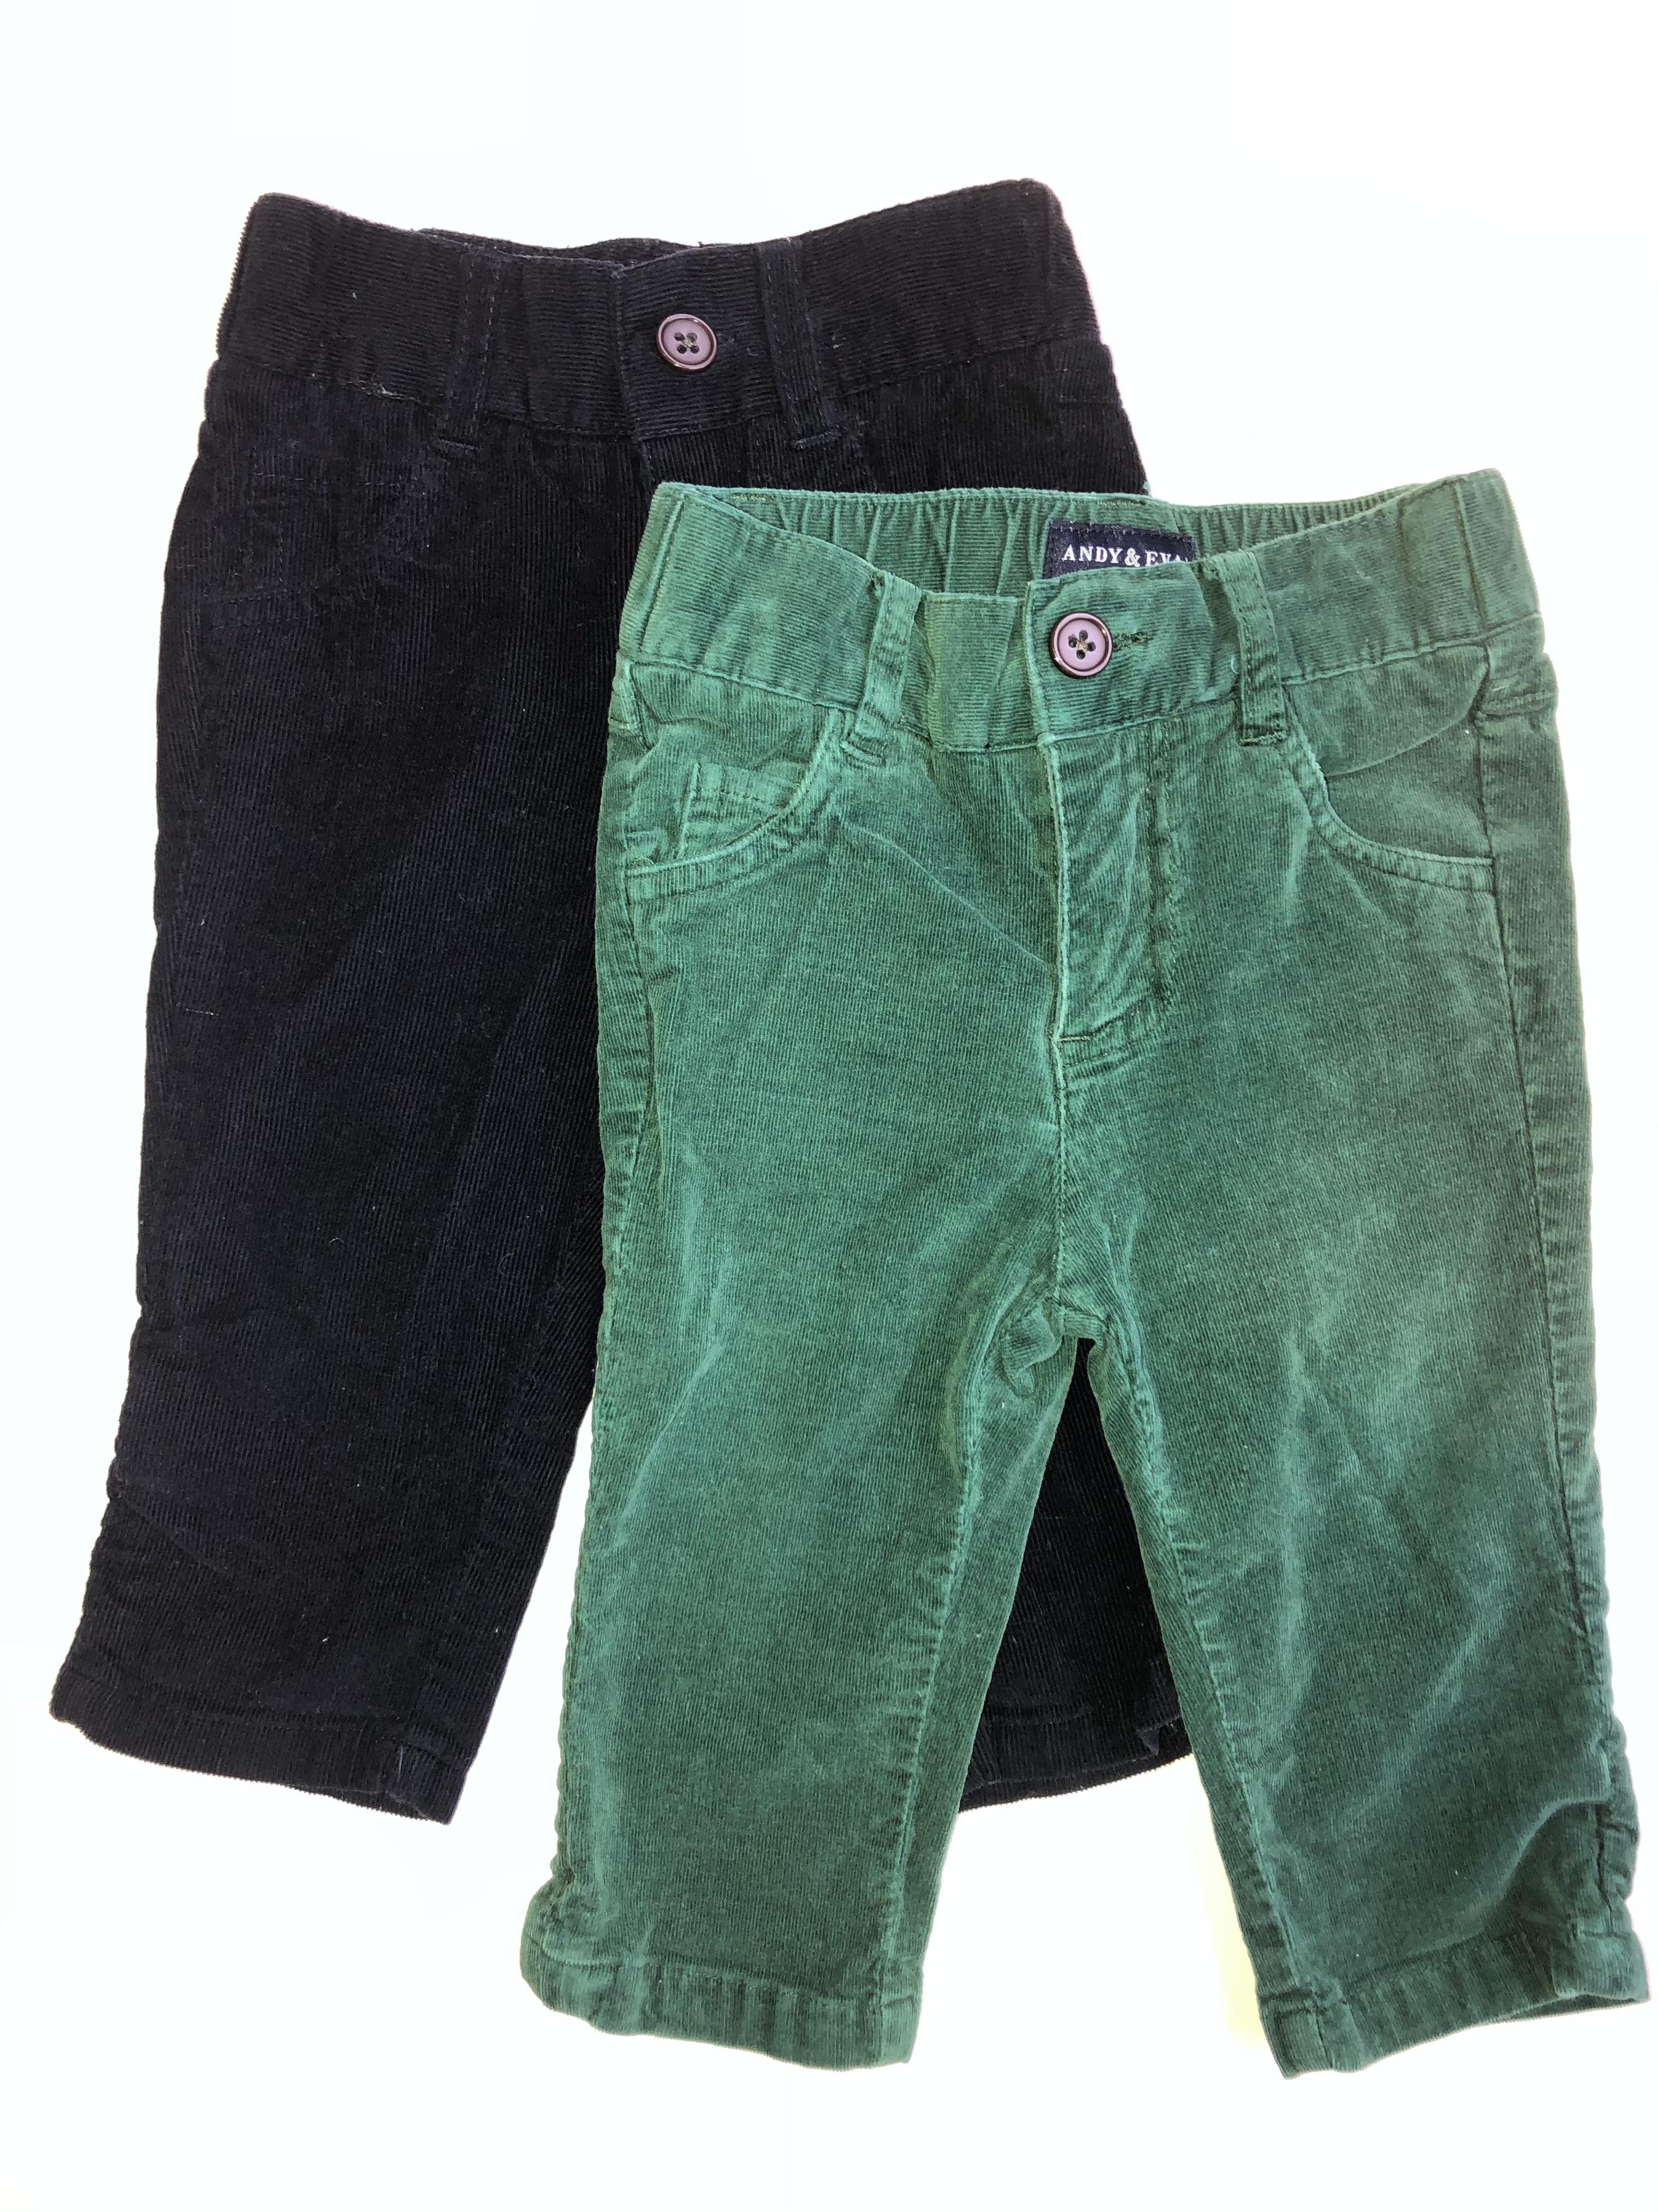 Andy & Evan 6-12M Pants, Jeans and Leggings